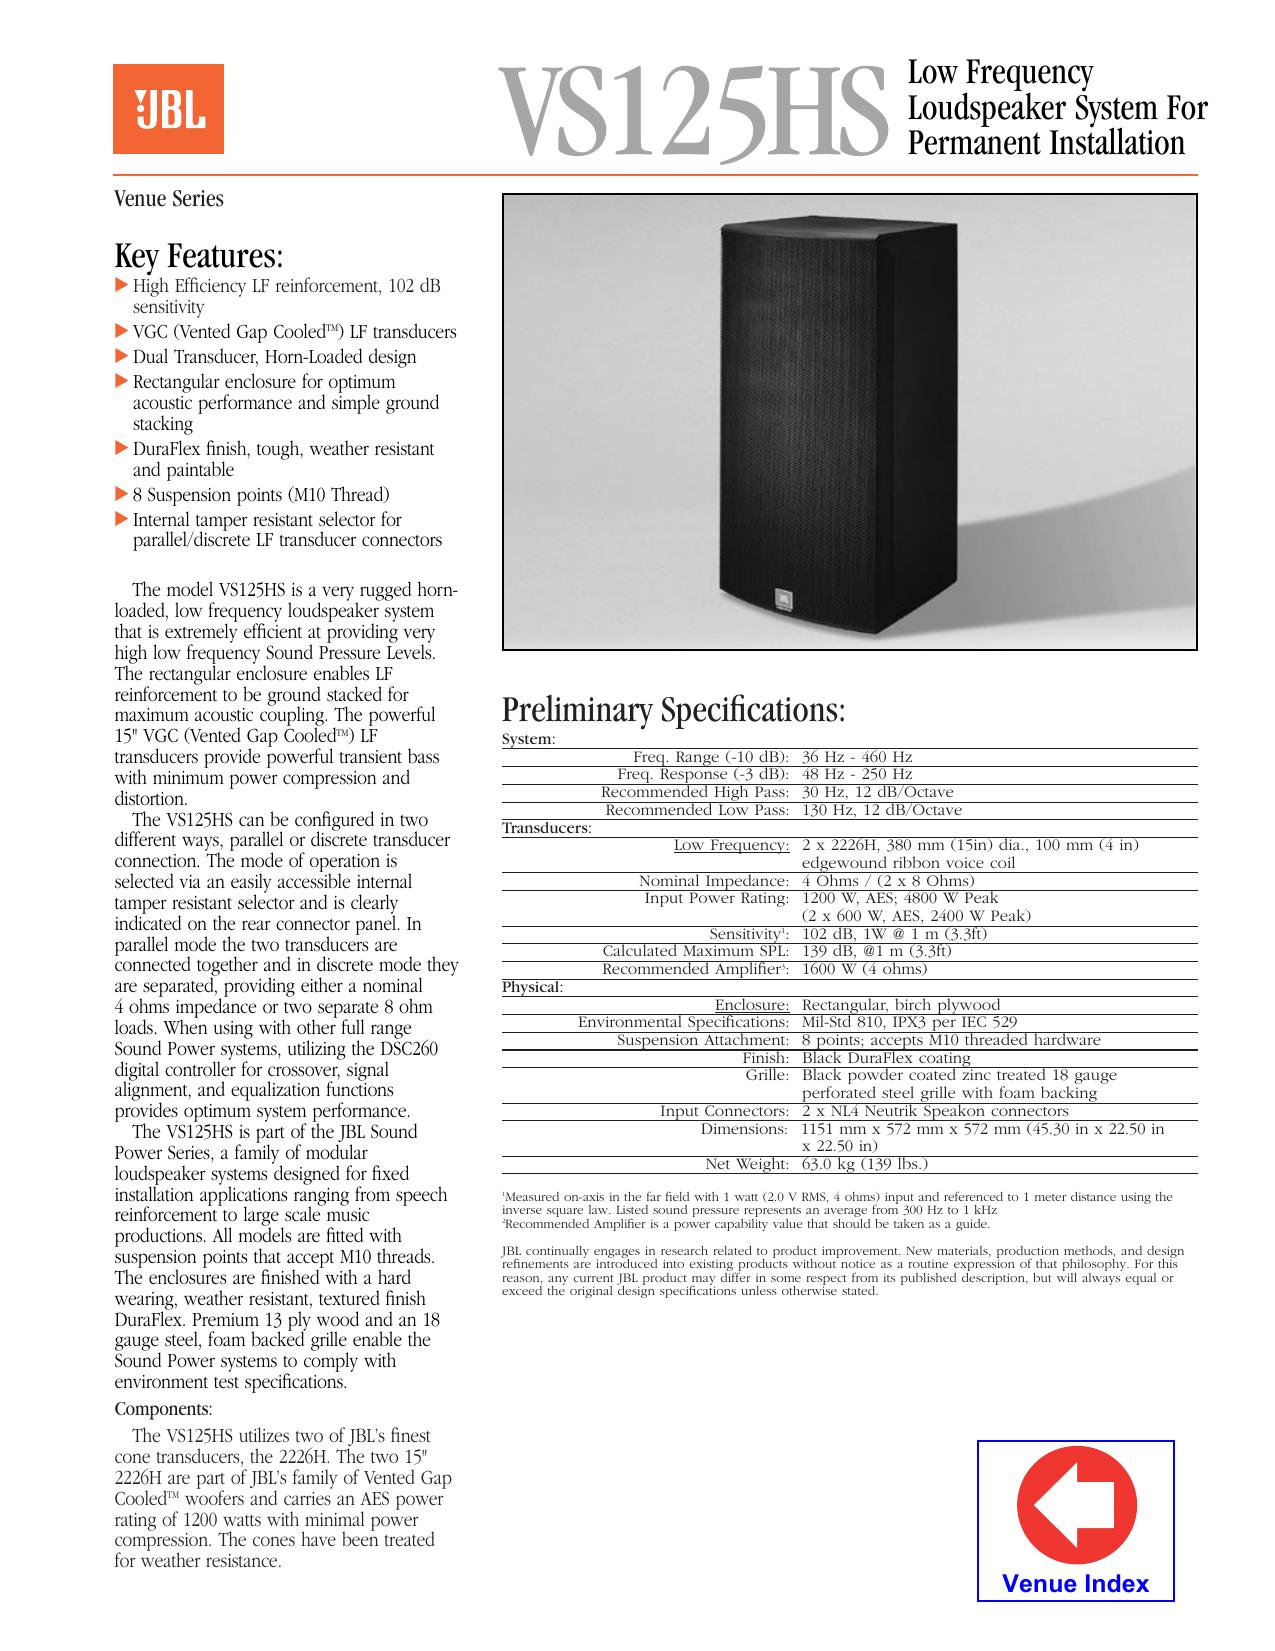 VS125HS Specification Document | manualzz com